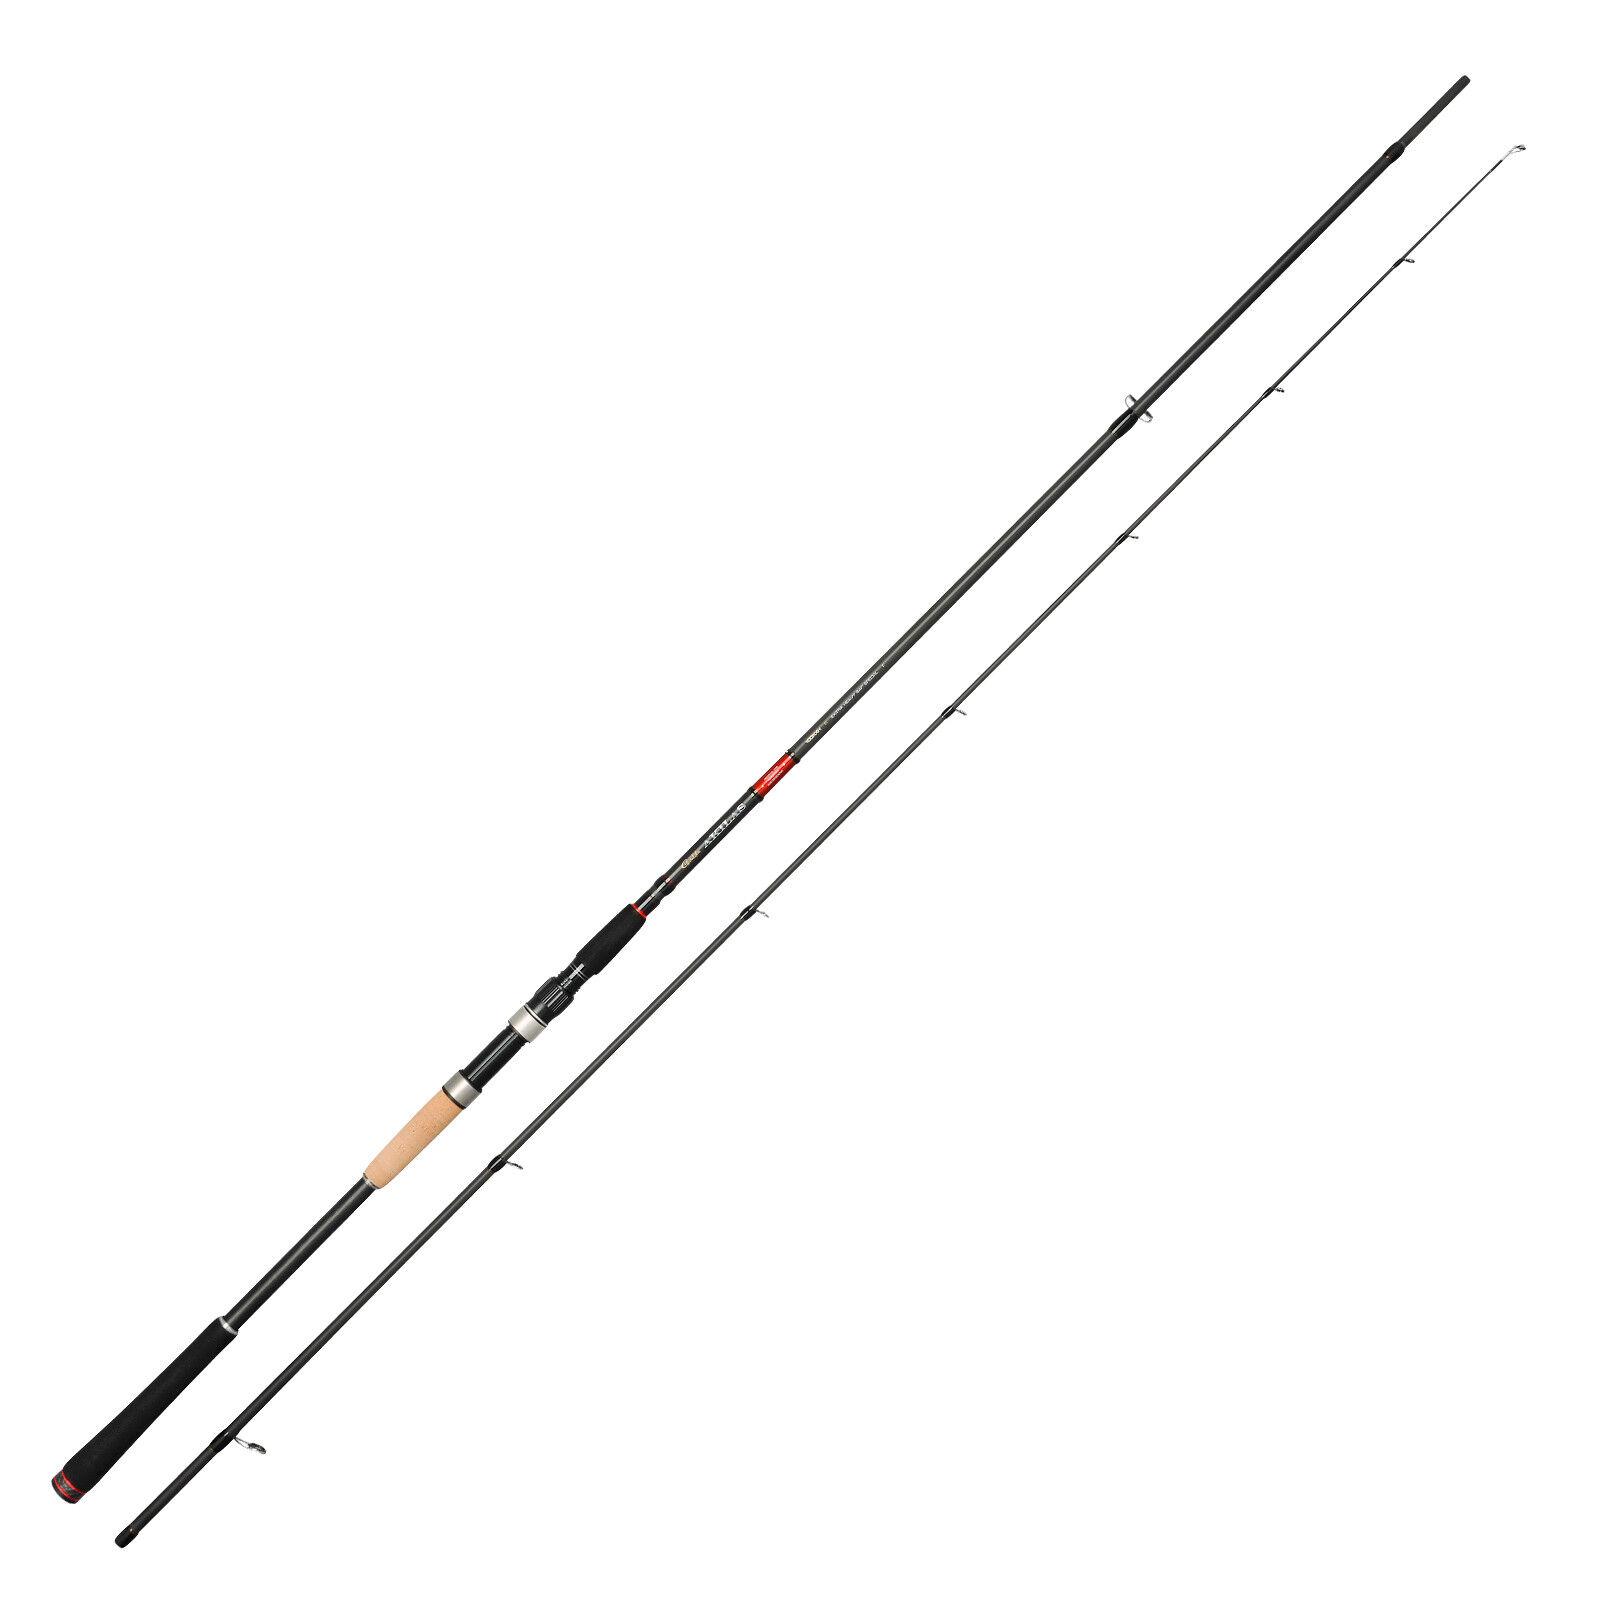 Cañas de GAMAKATSU Pro Spinning Rod - 2018 Akilas 100XXH largo 3, 00 m WG 25-80 g